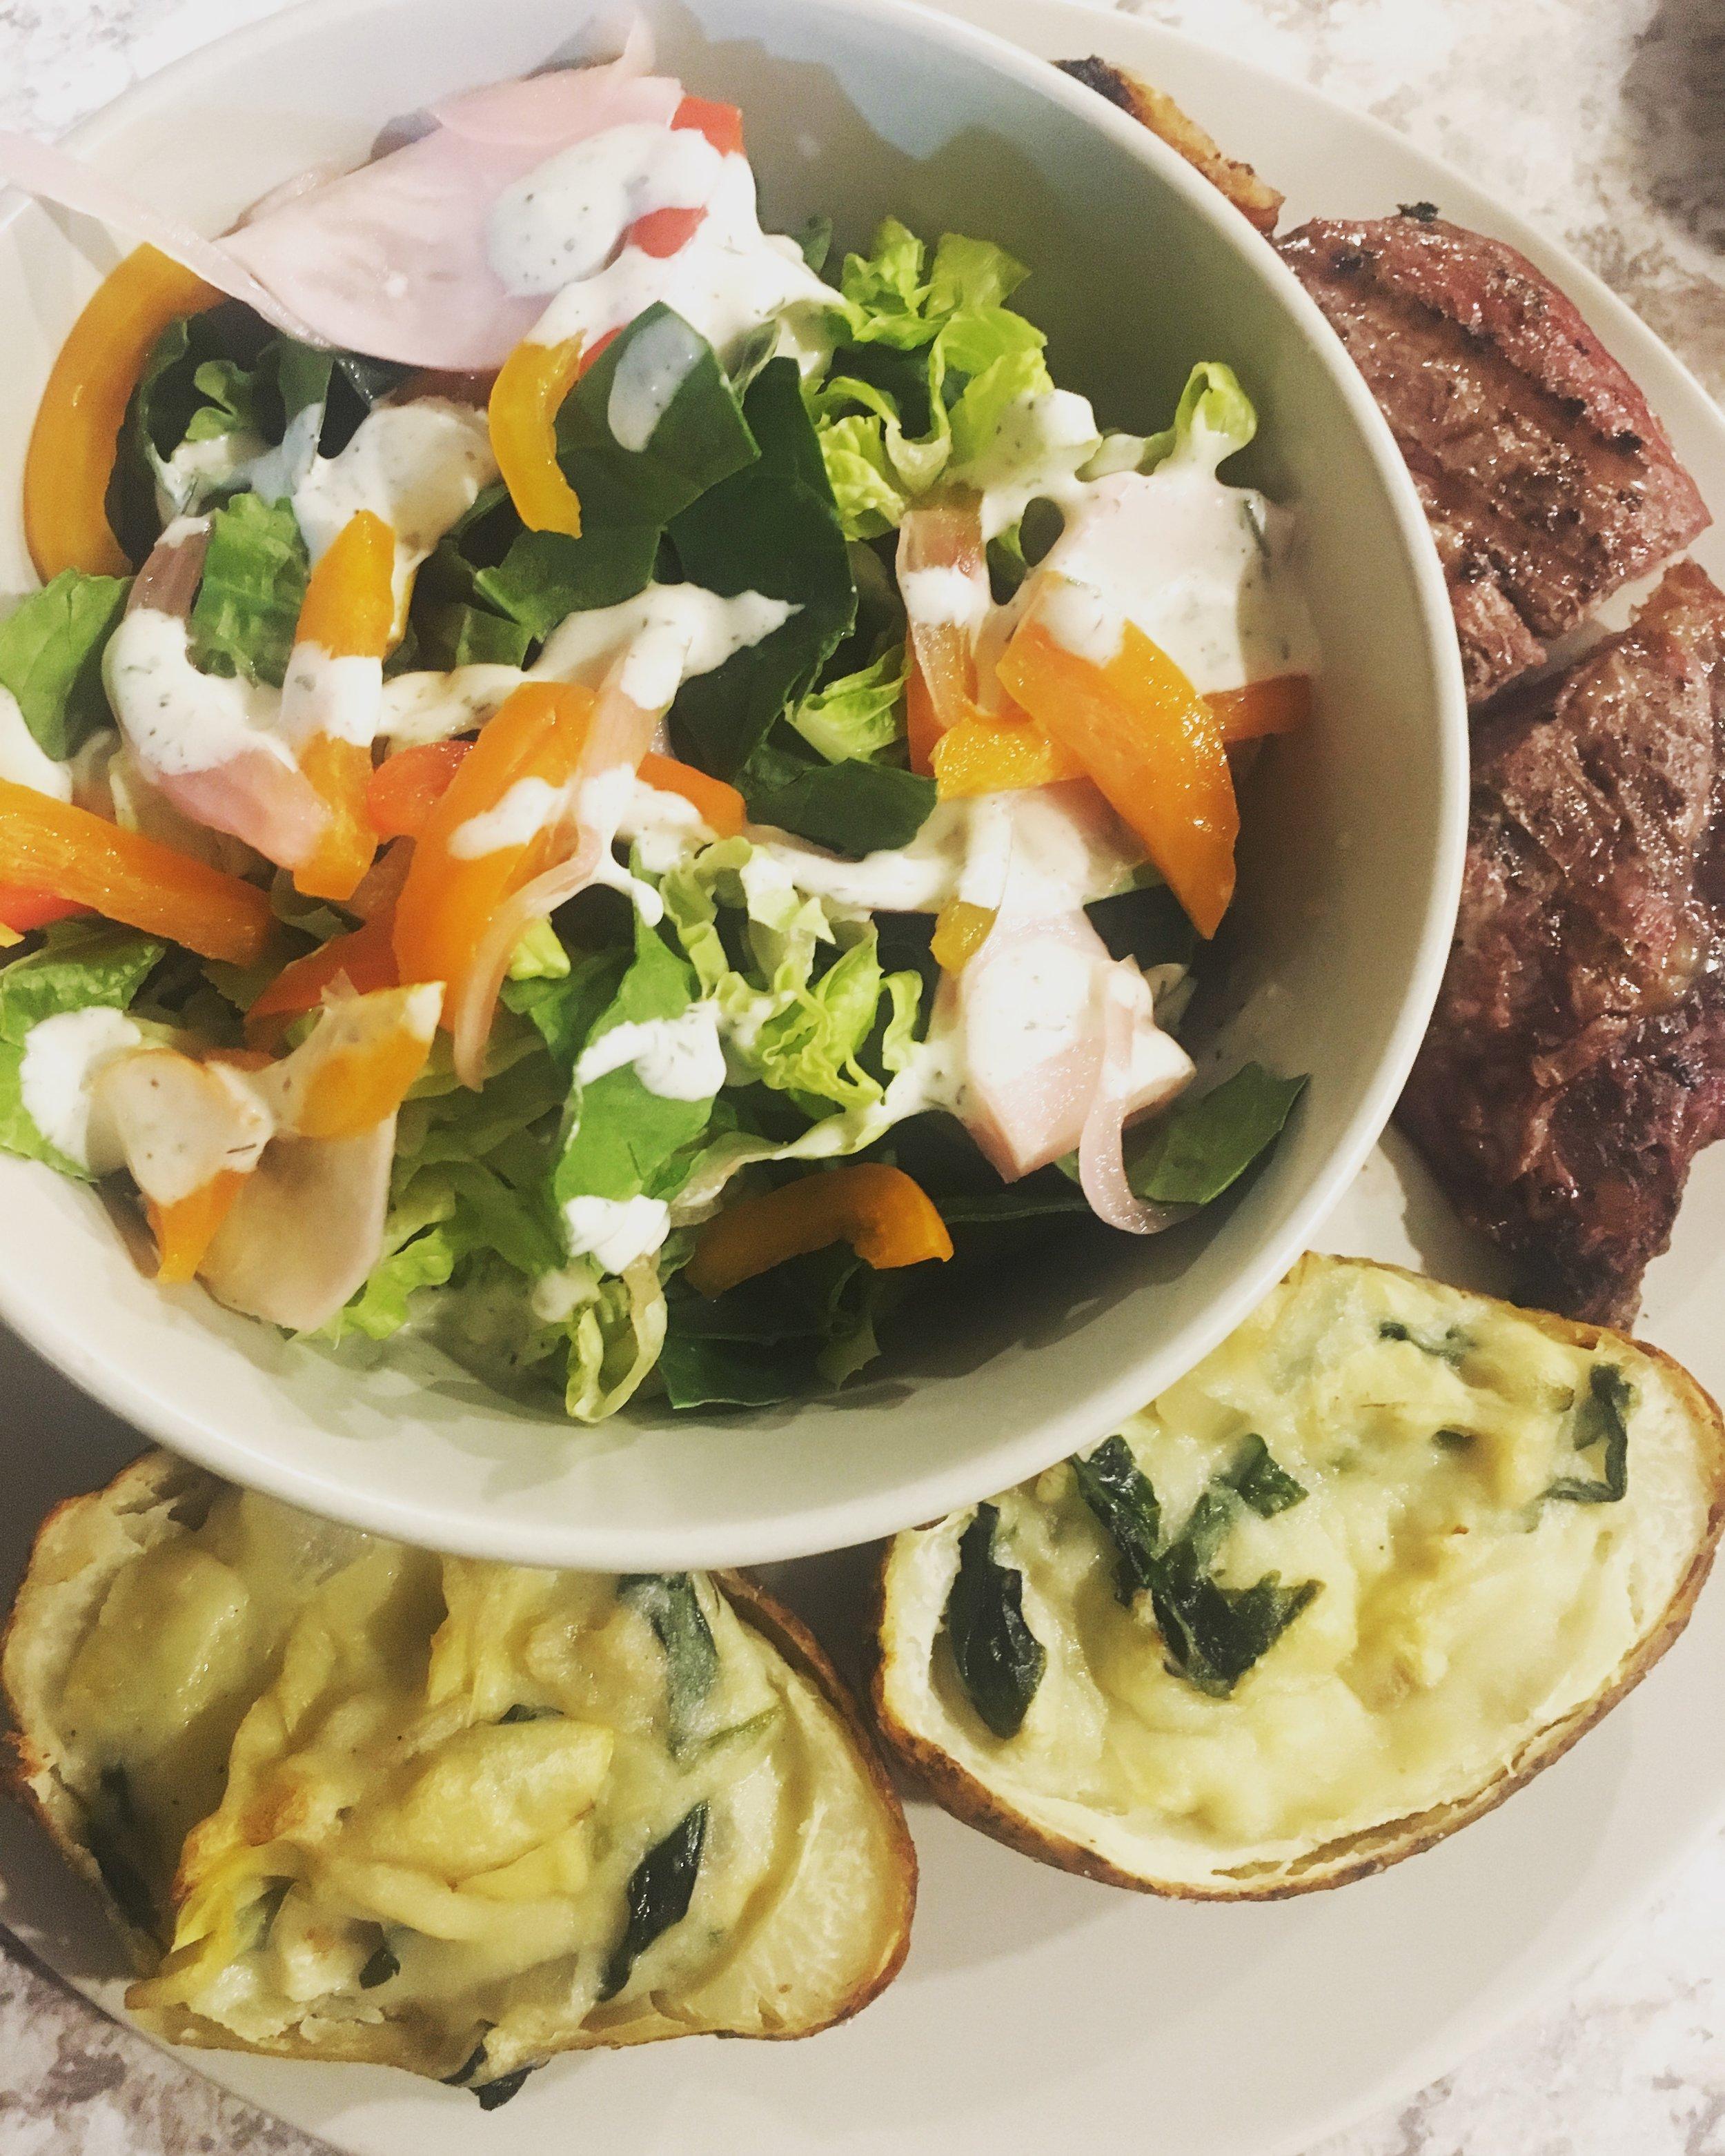 garden salad, grassfed ribeye steak, twice baked spinach artichoke potatoes